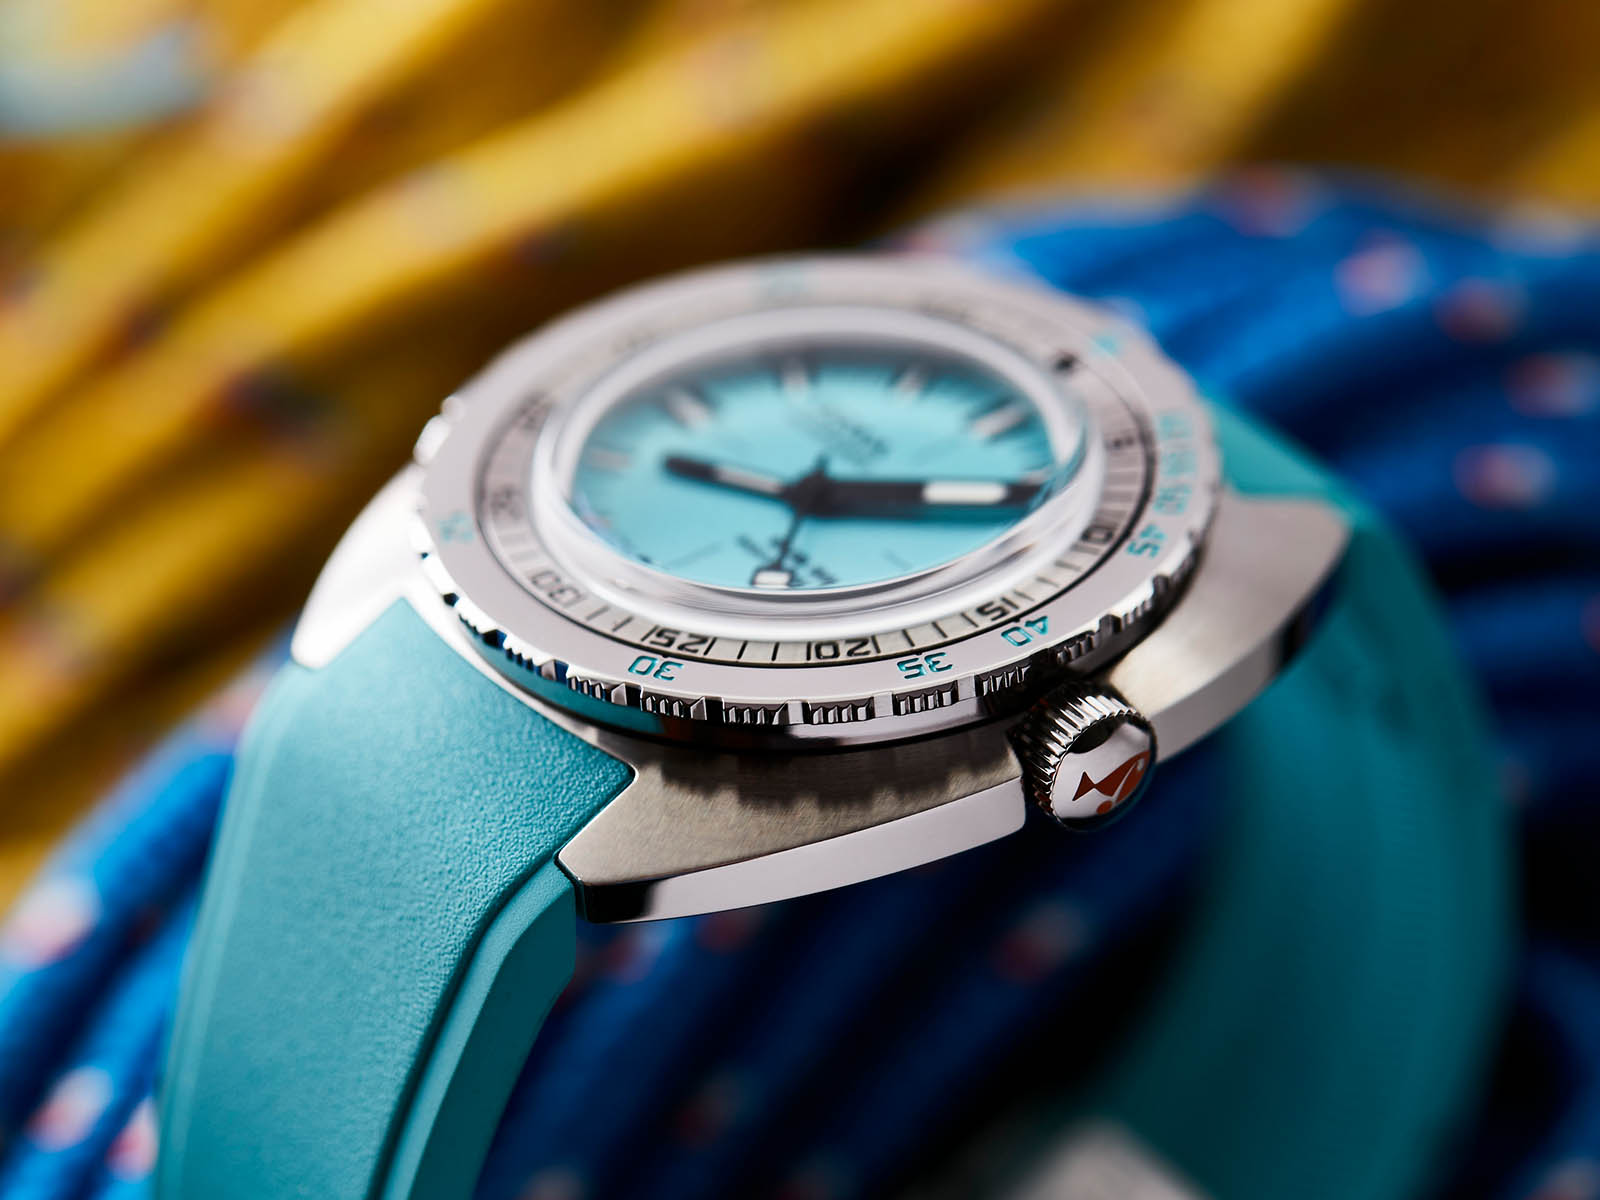 821-10-241-25-doxa-sub300-aquamarine-2.jpg